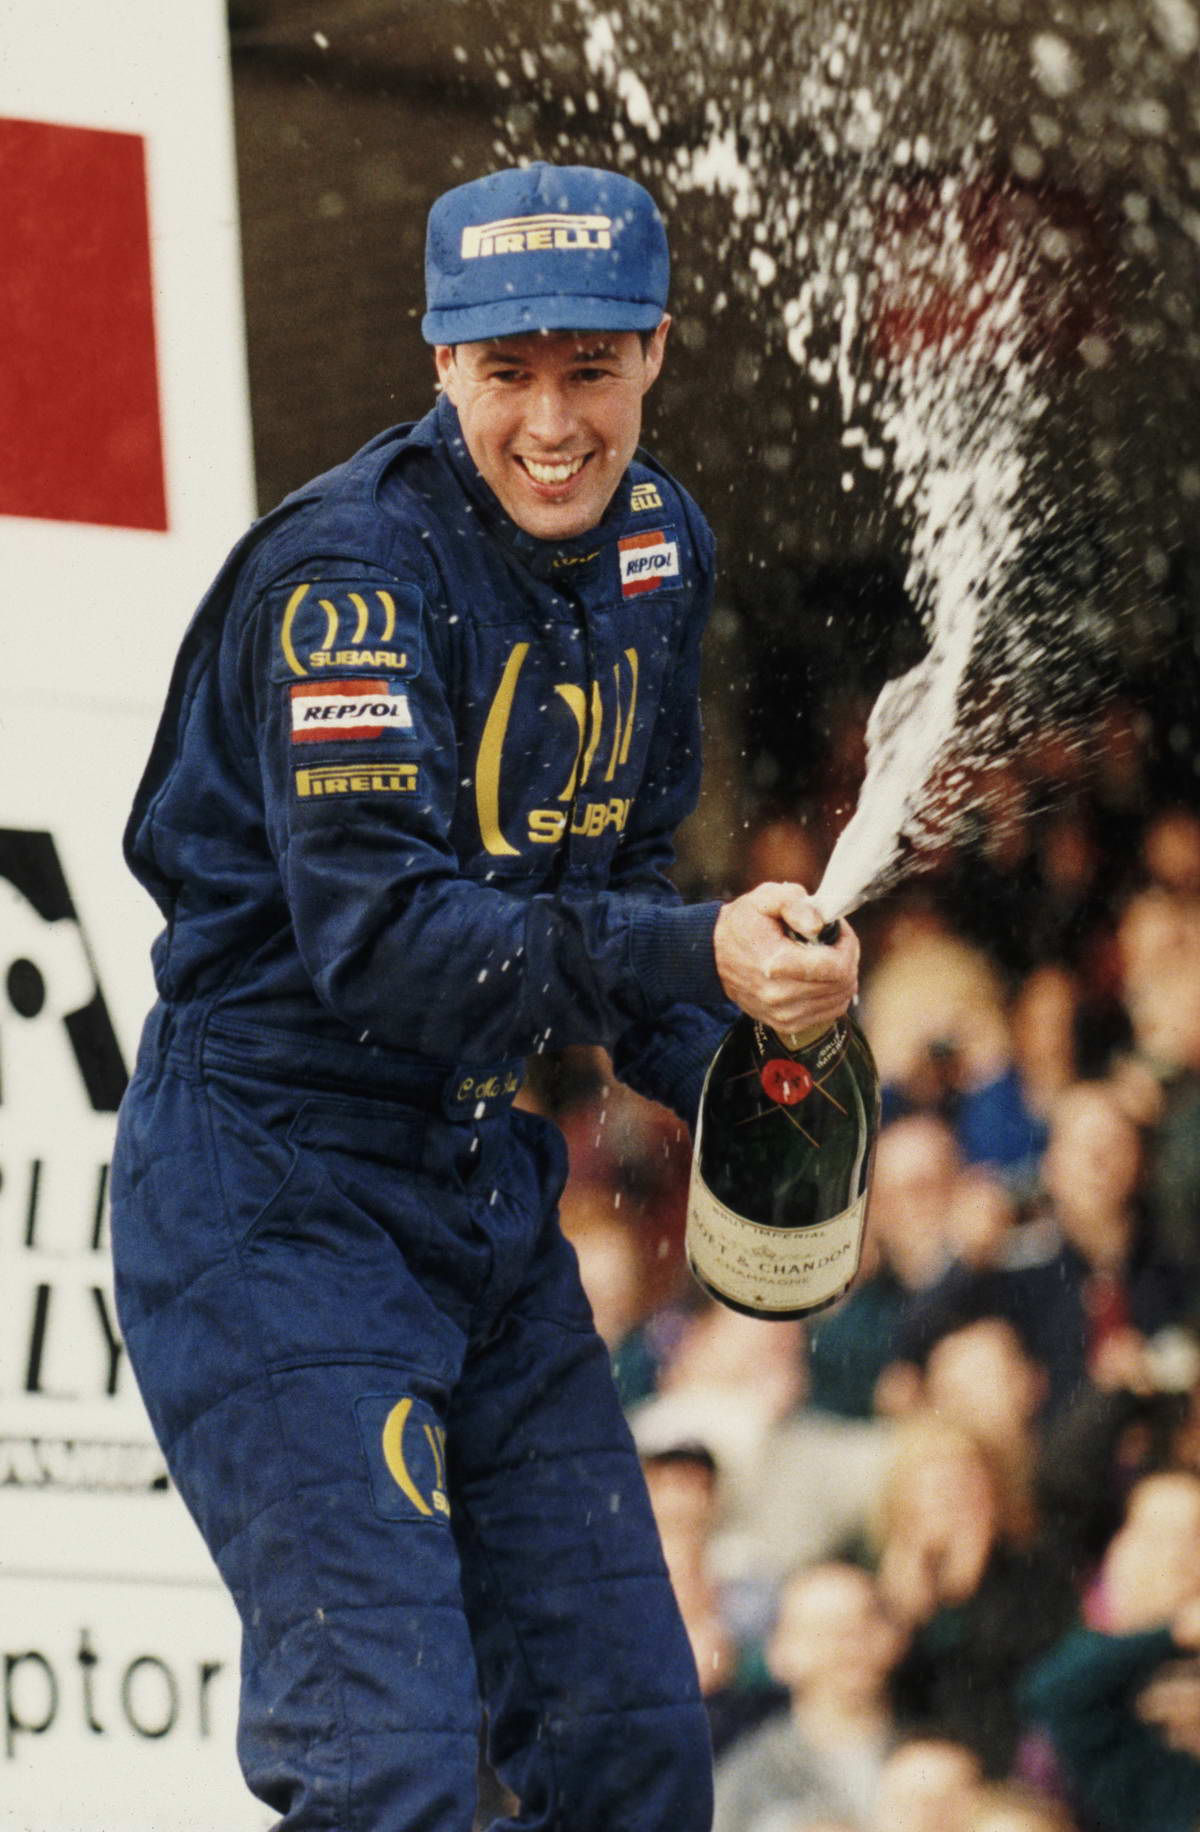 Colin McRae 1995